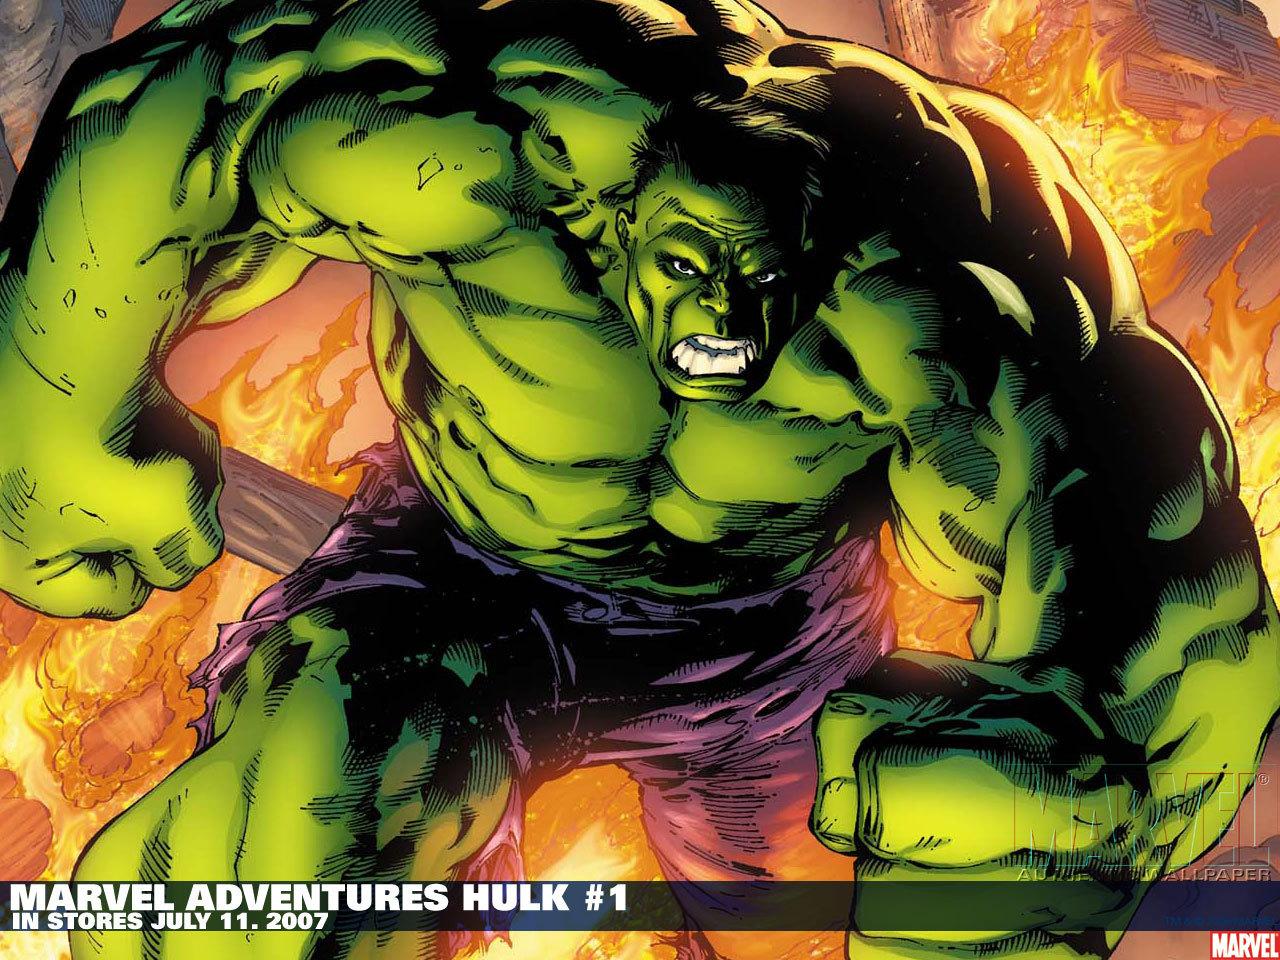 Hulk   The Incredible Hulk Wallpaper 14044604 1280x960